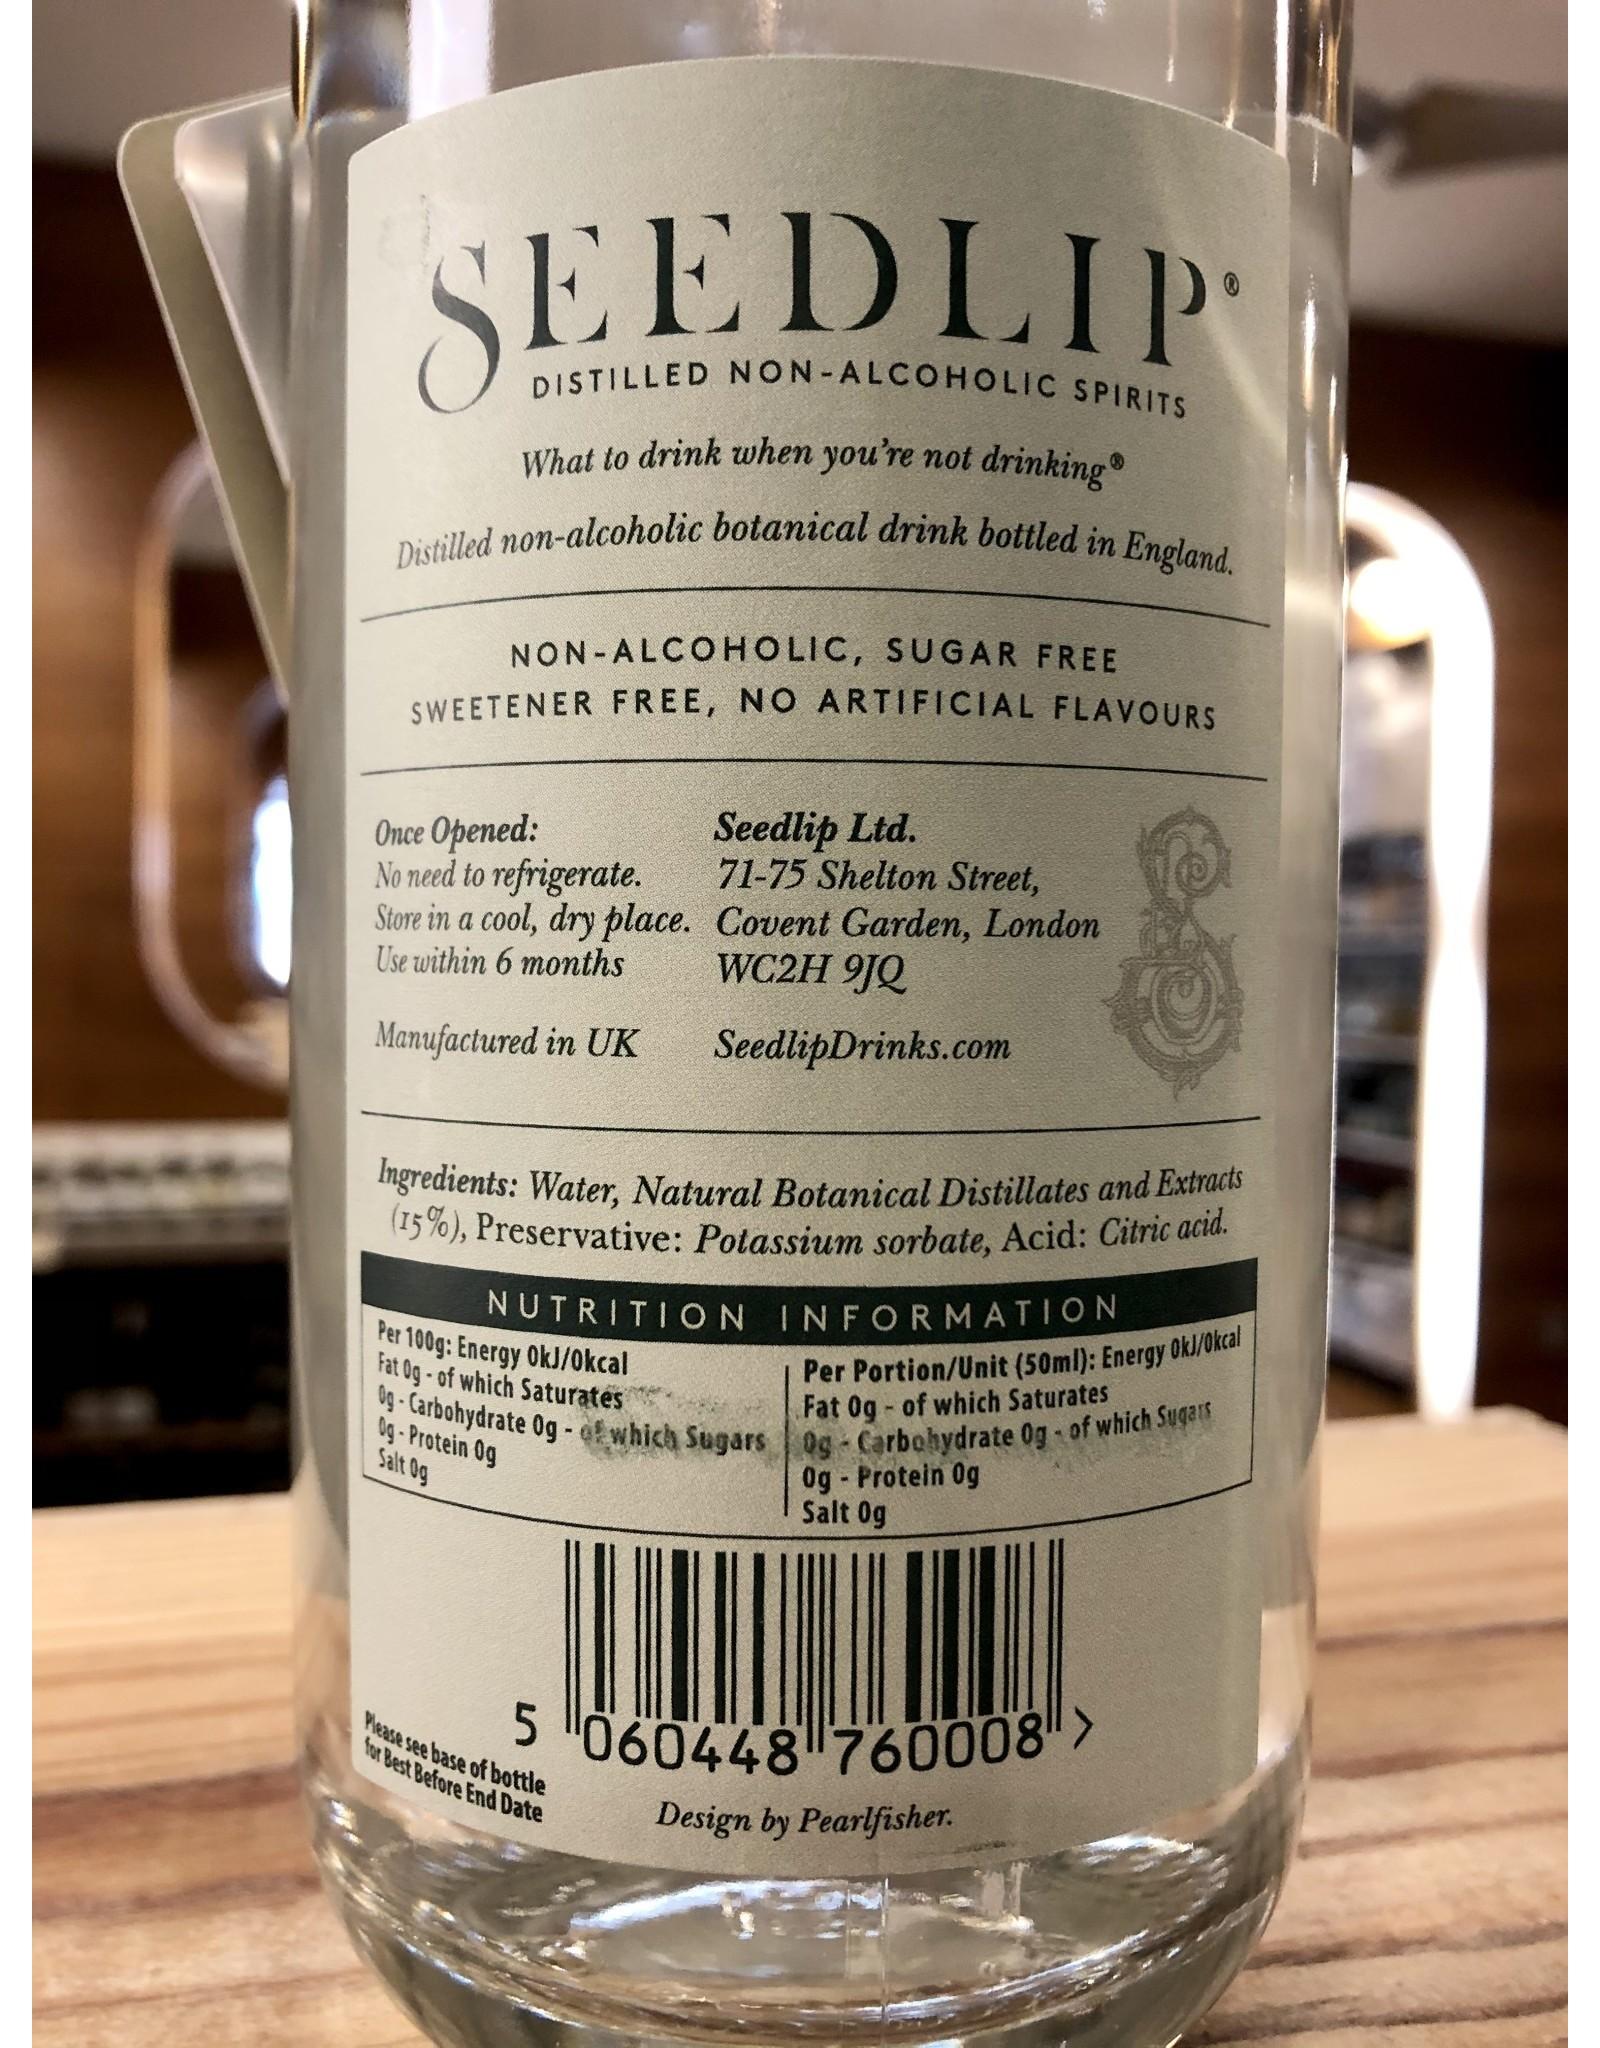 Seedlip Spice Aromatic Non-Alcoholic Spirit - 700 ML